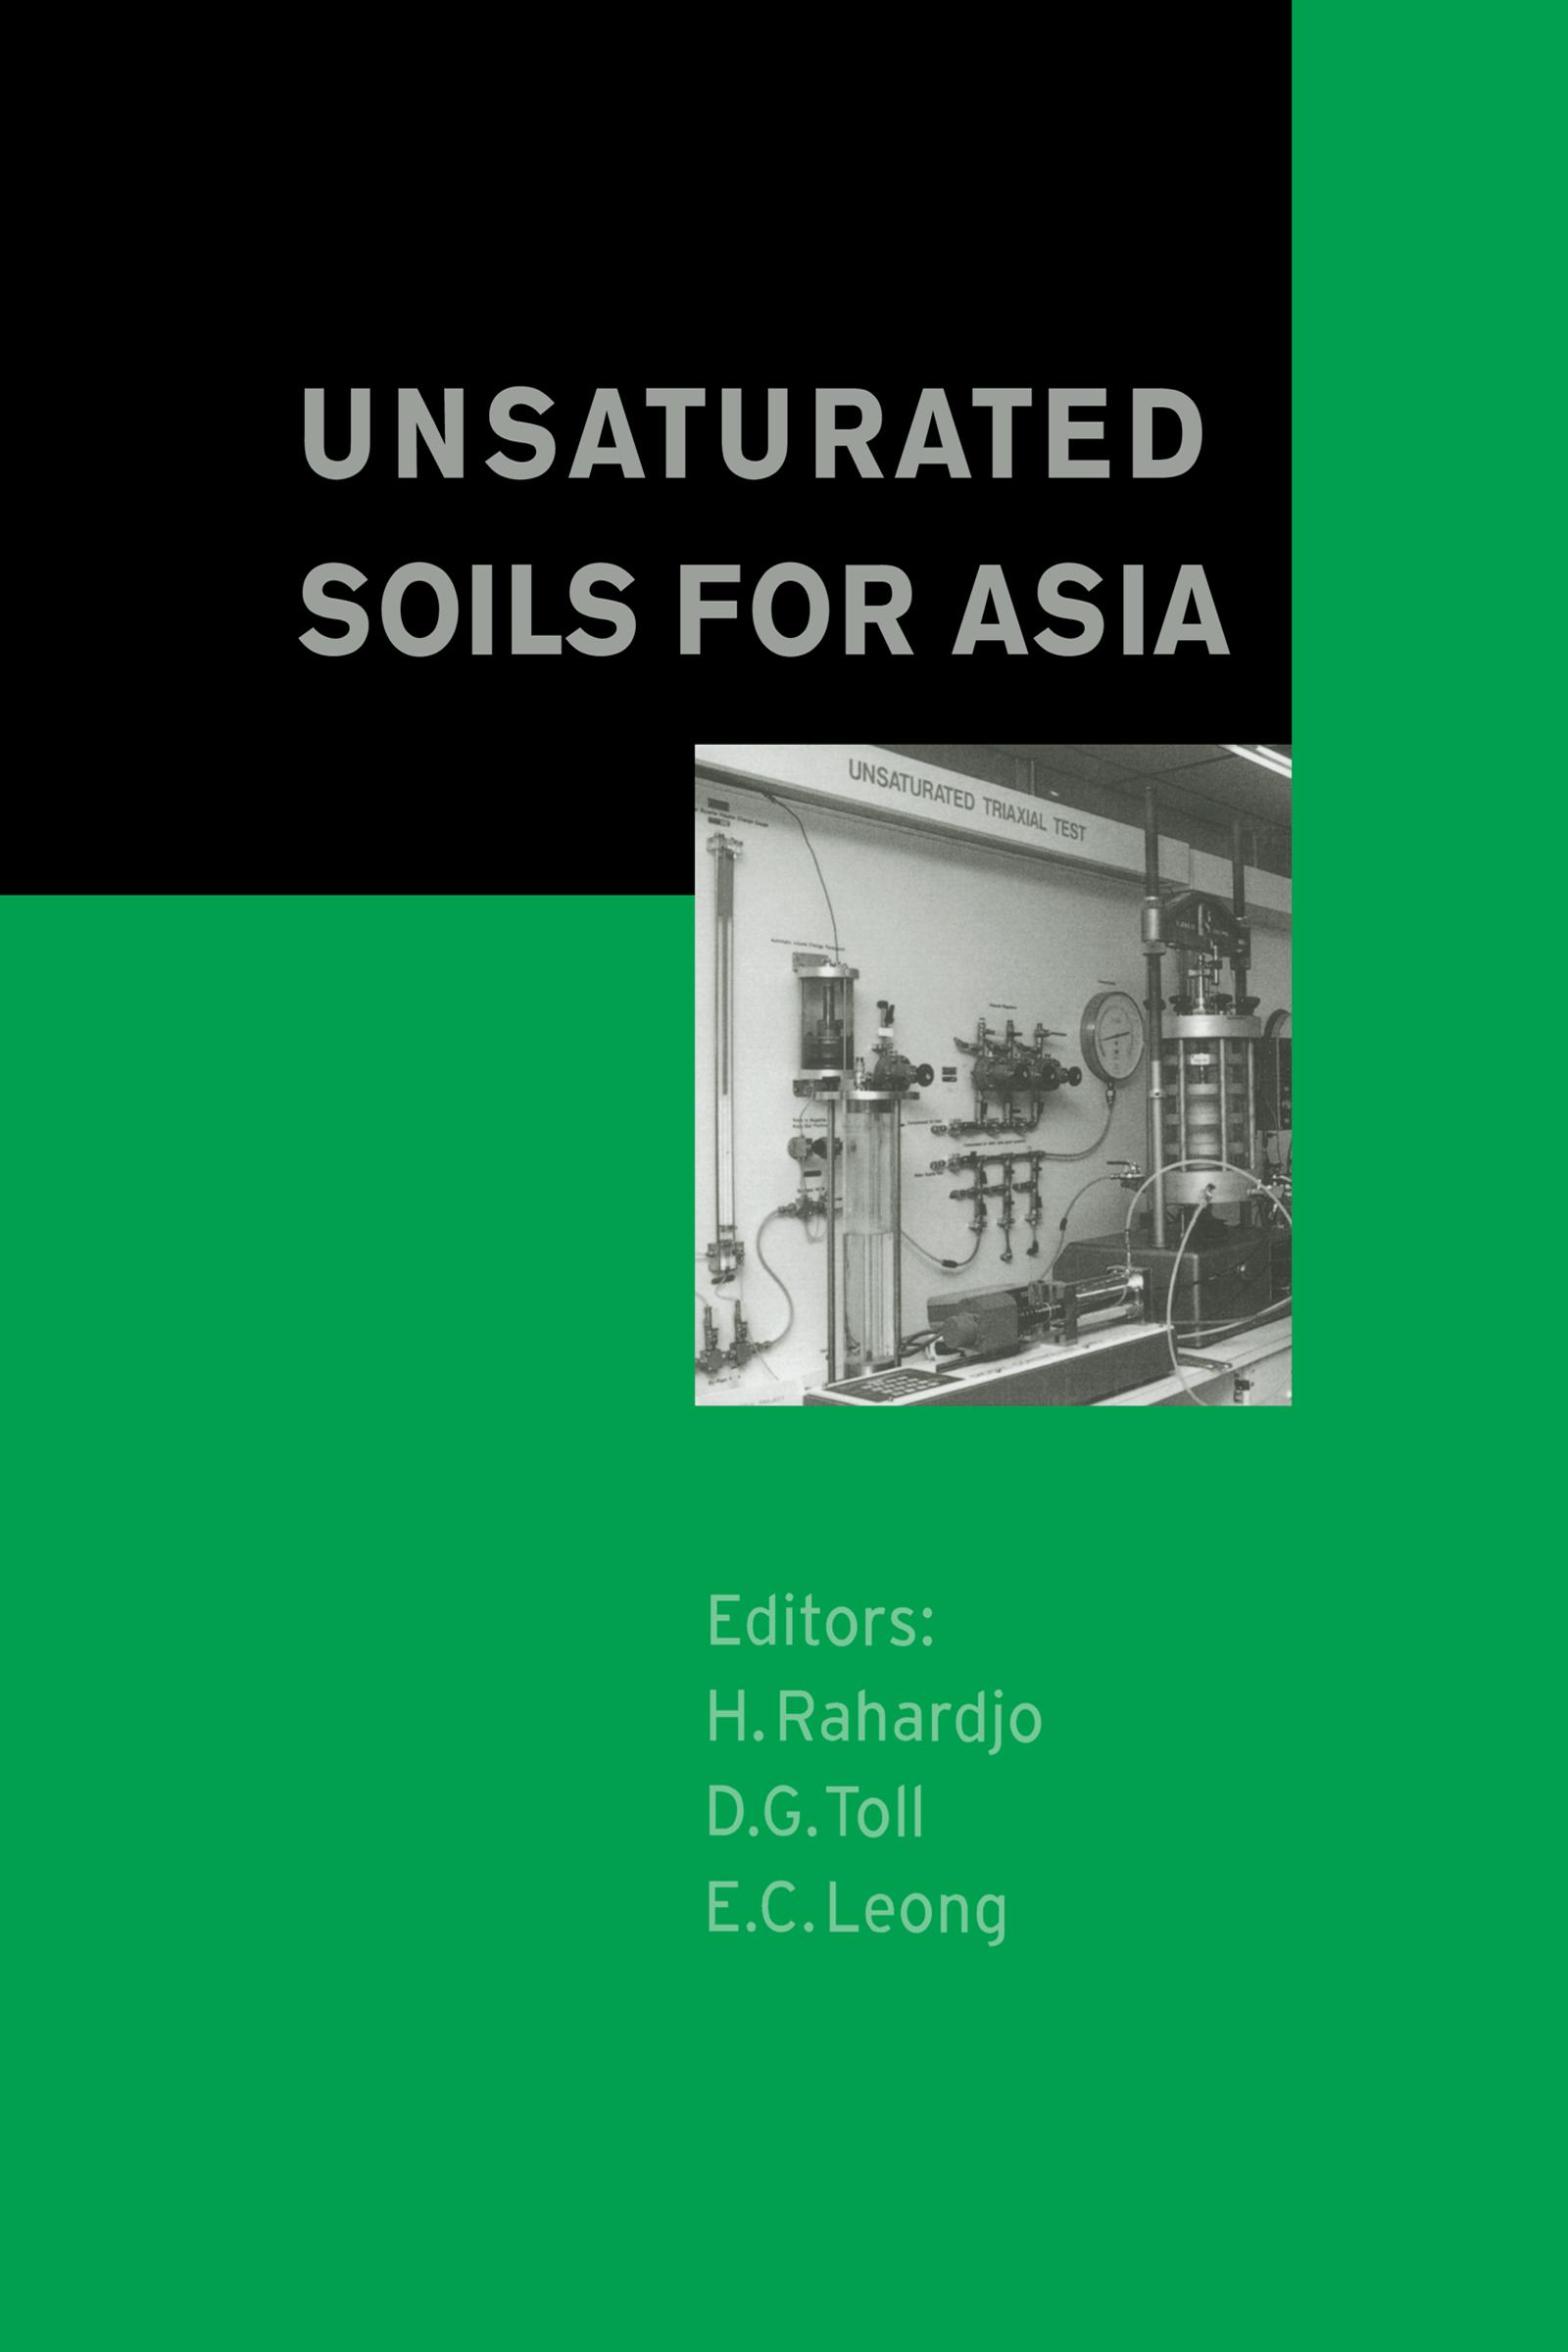 A comparison of in-situ soil suction measurements